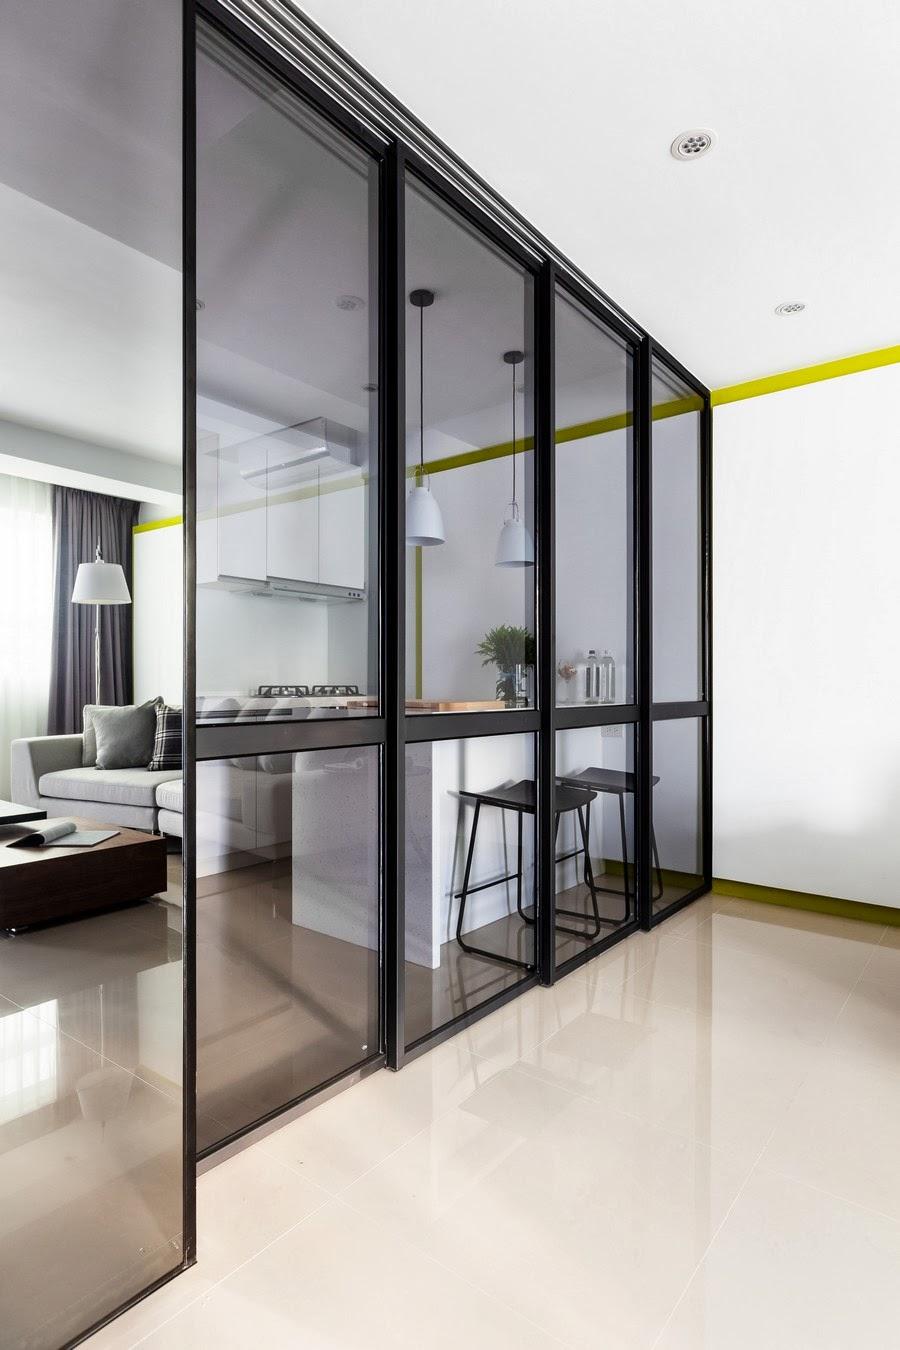 amenajari, interioare, decoratiuni, decor, design interior, colorat, apartament, modern, living, bar, bucatarie, usa glisanta,